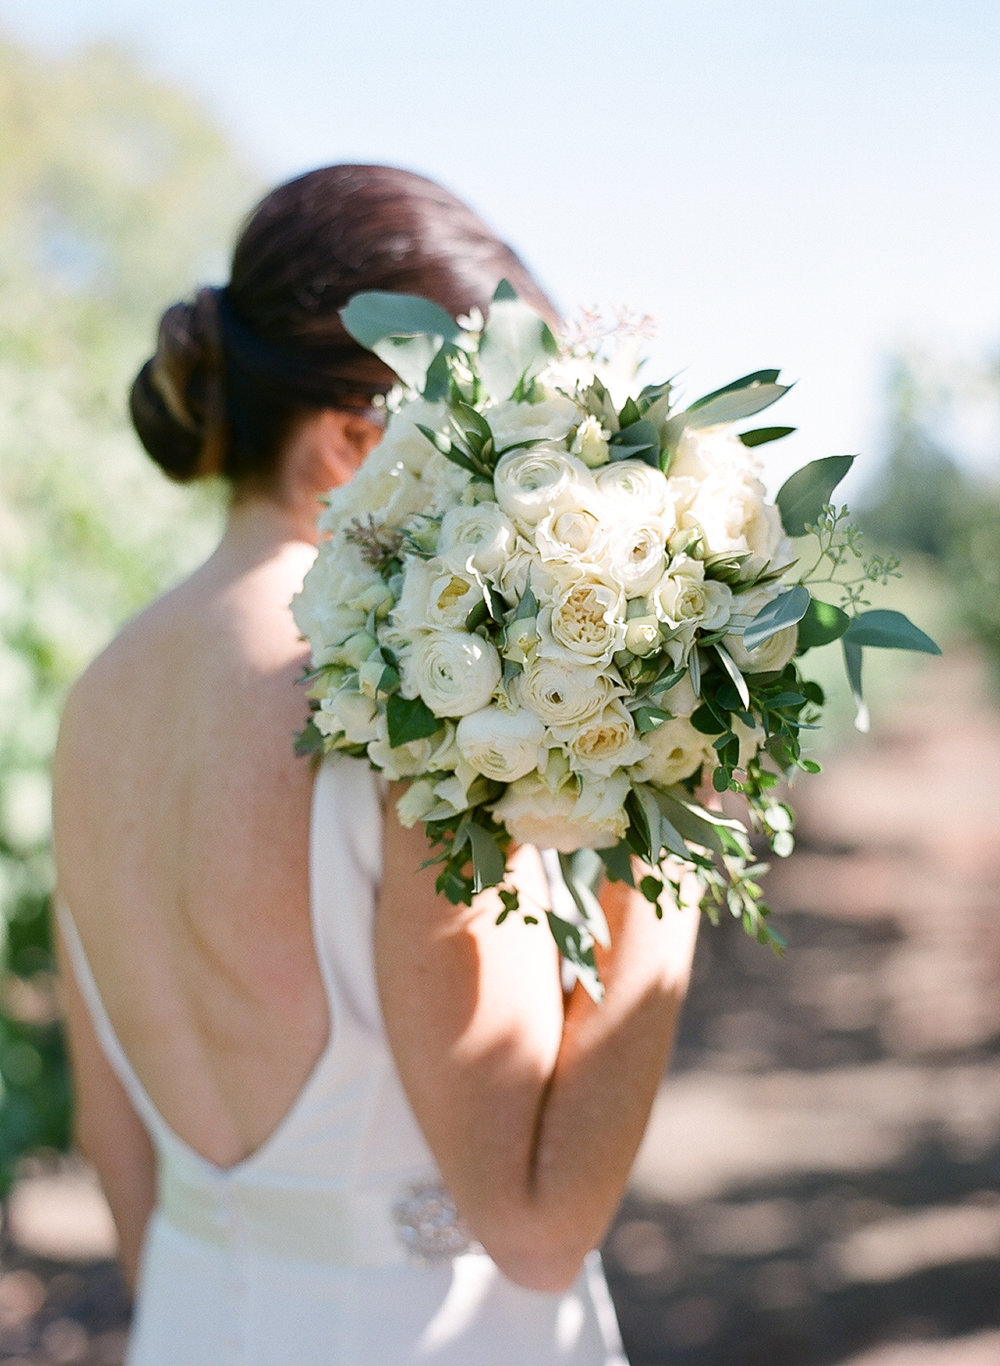 Bonphotage Napa San Francisco Fine Art Wedding Photography